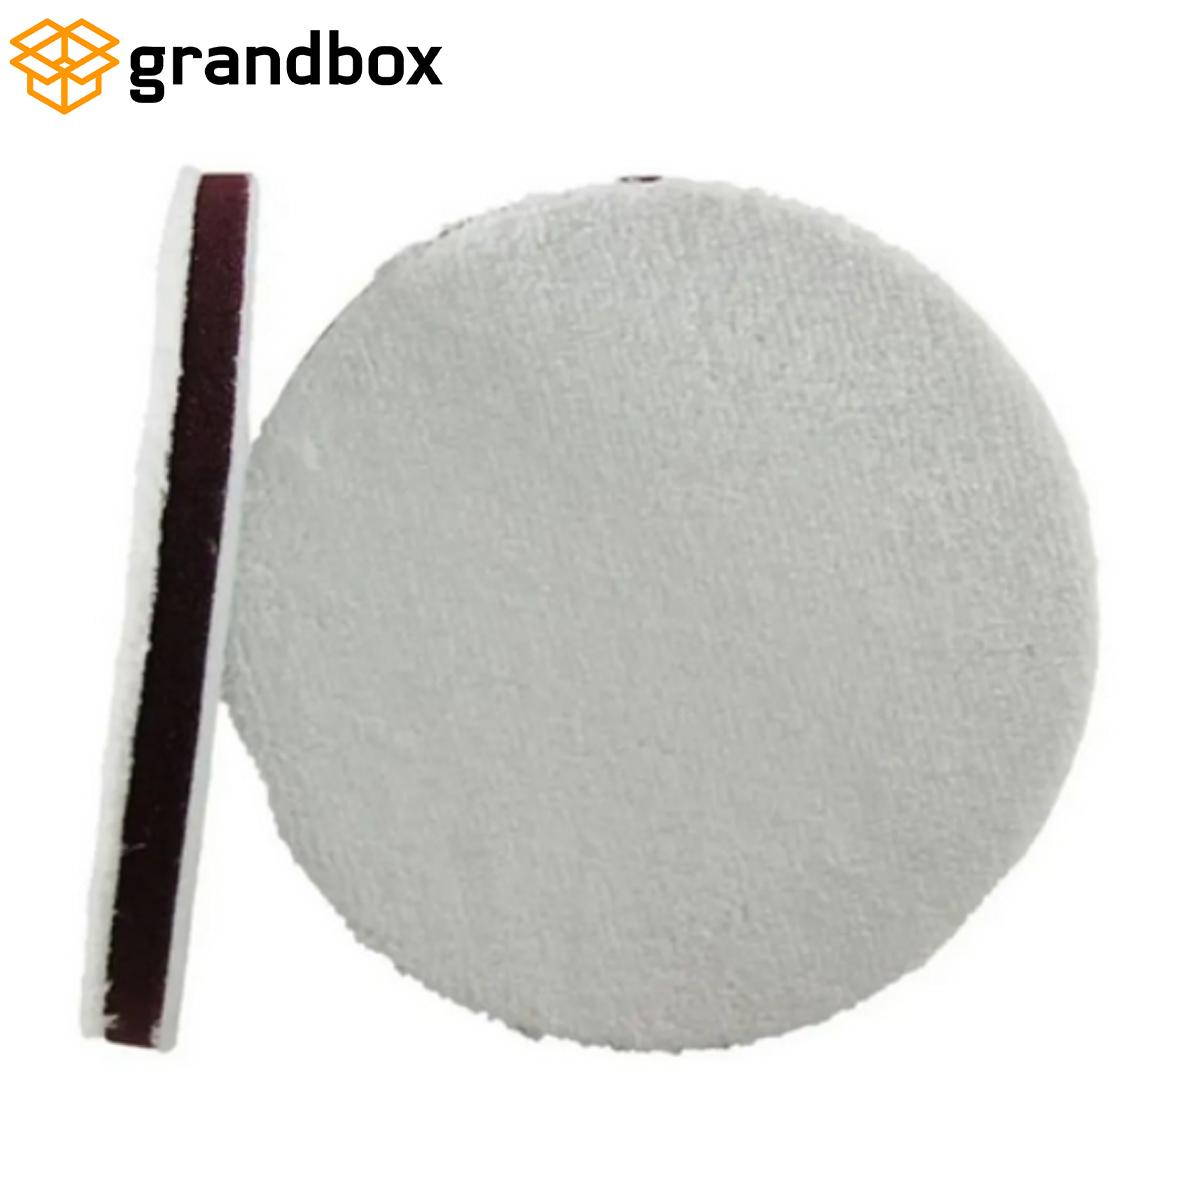 Boina De Micro Fibra P Corte 5,5' Bm5p Mandala